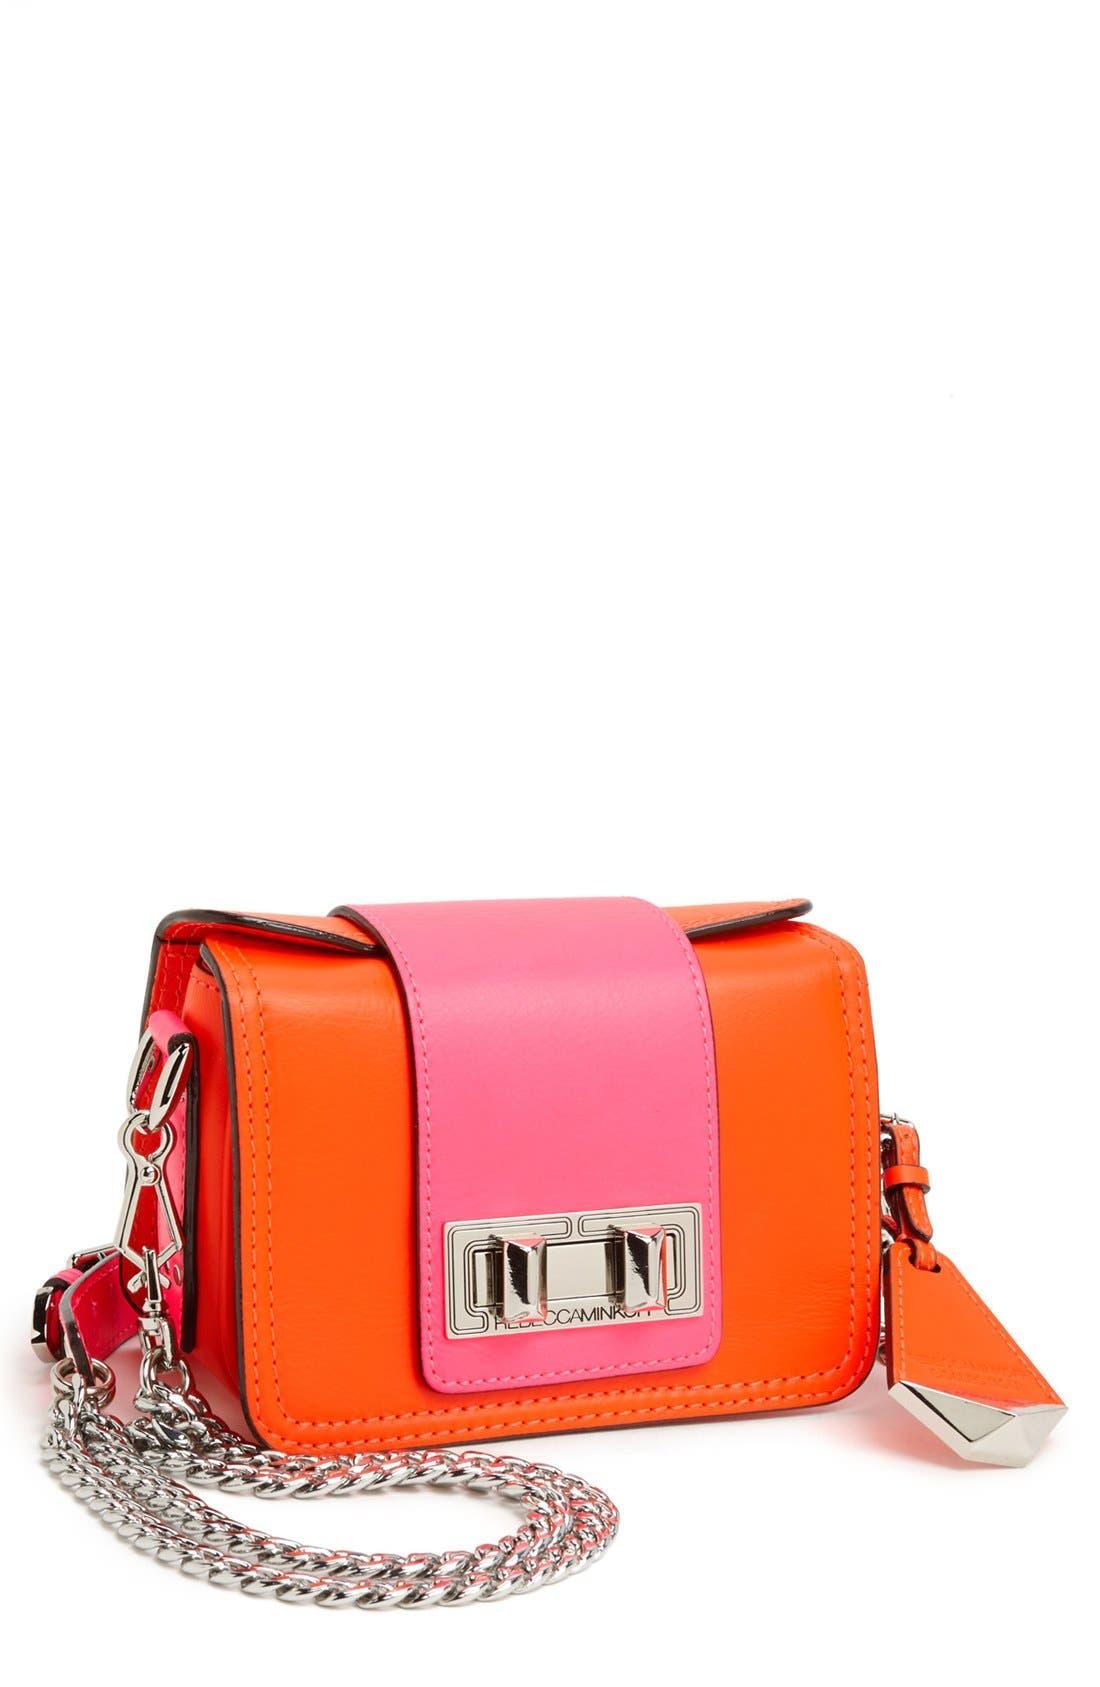 Main Image - Rebecca Minkoff 'Sammy - Mini' Crossbody Bag